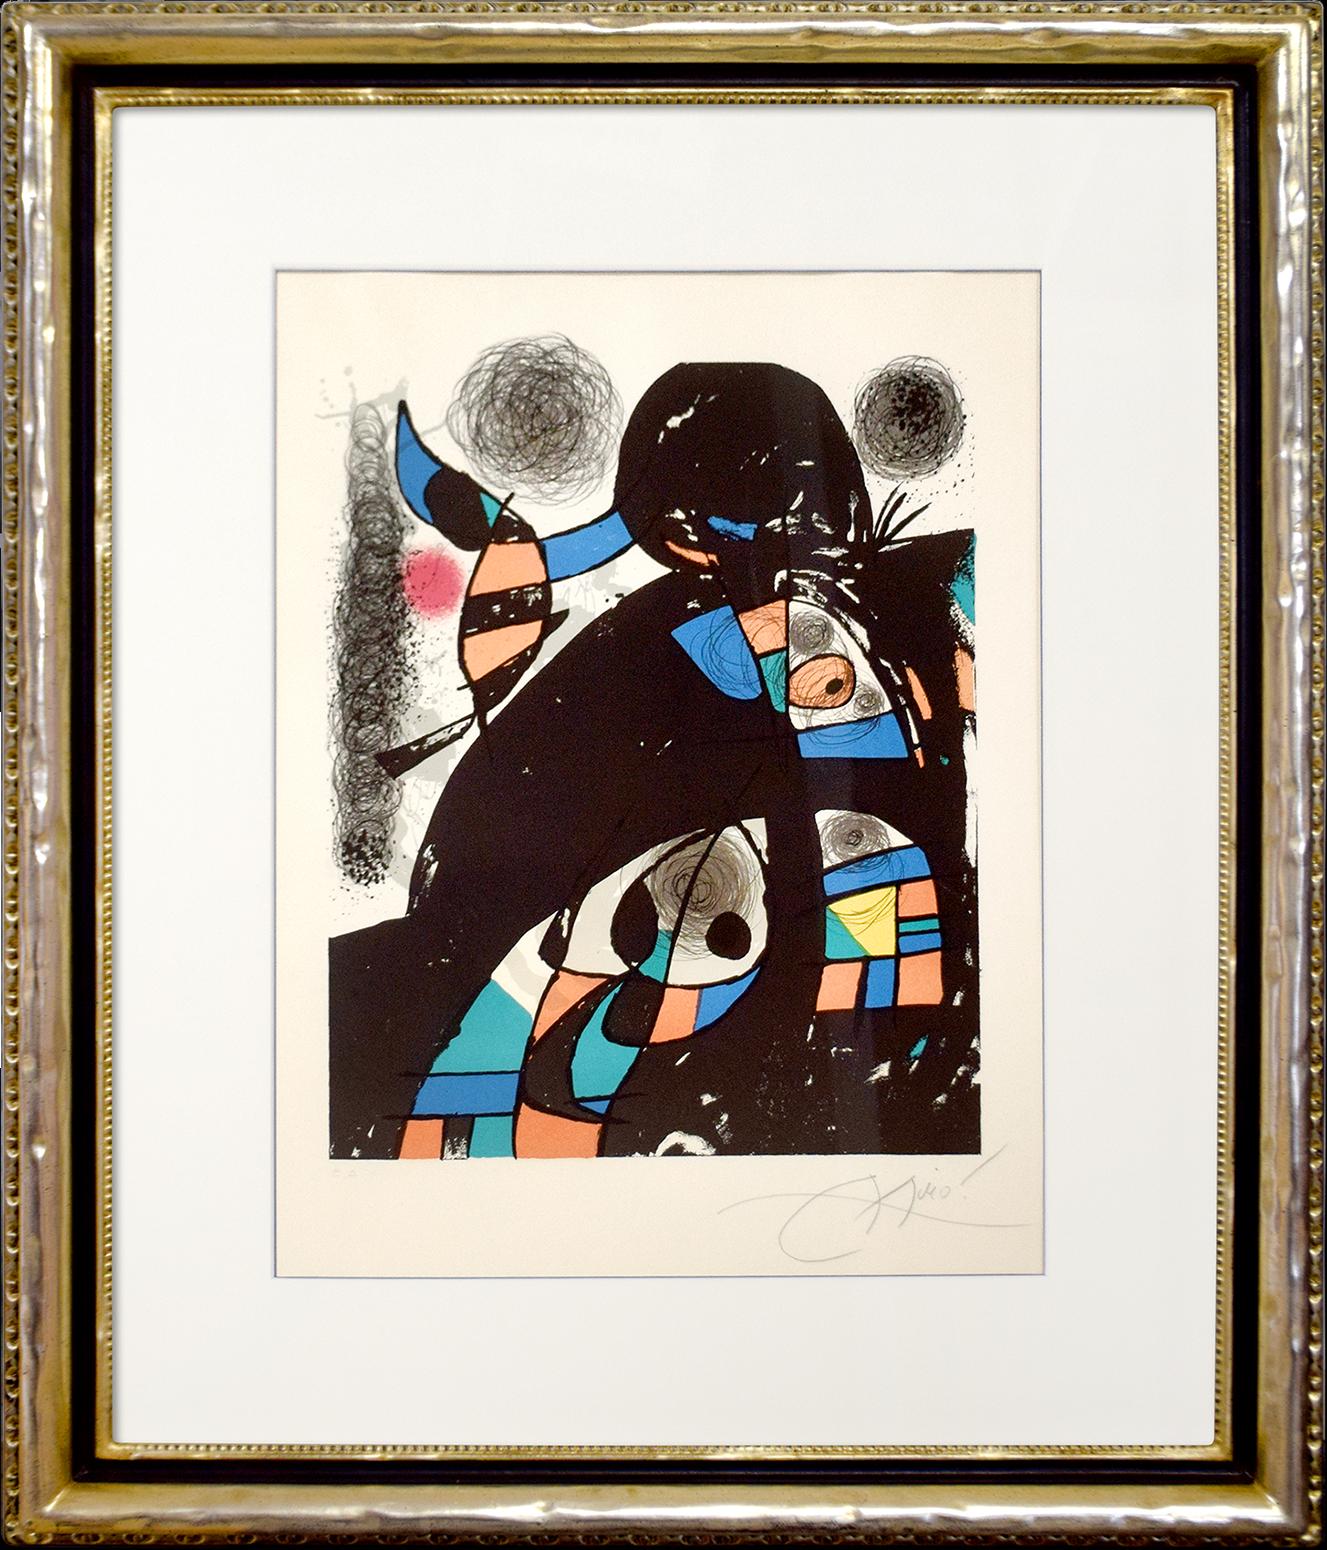 Joan Miró - San Lazzaro et ses amis , 0612-008-100